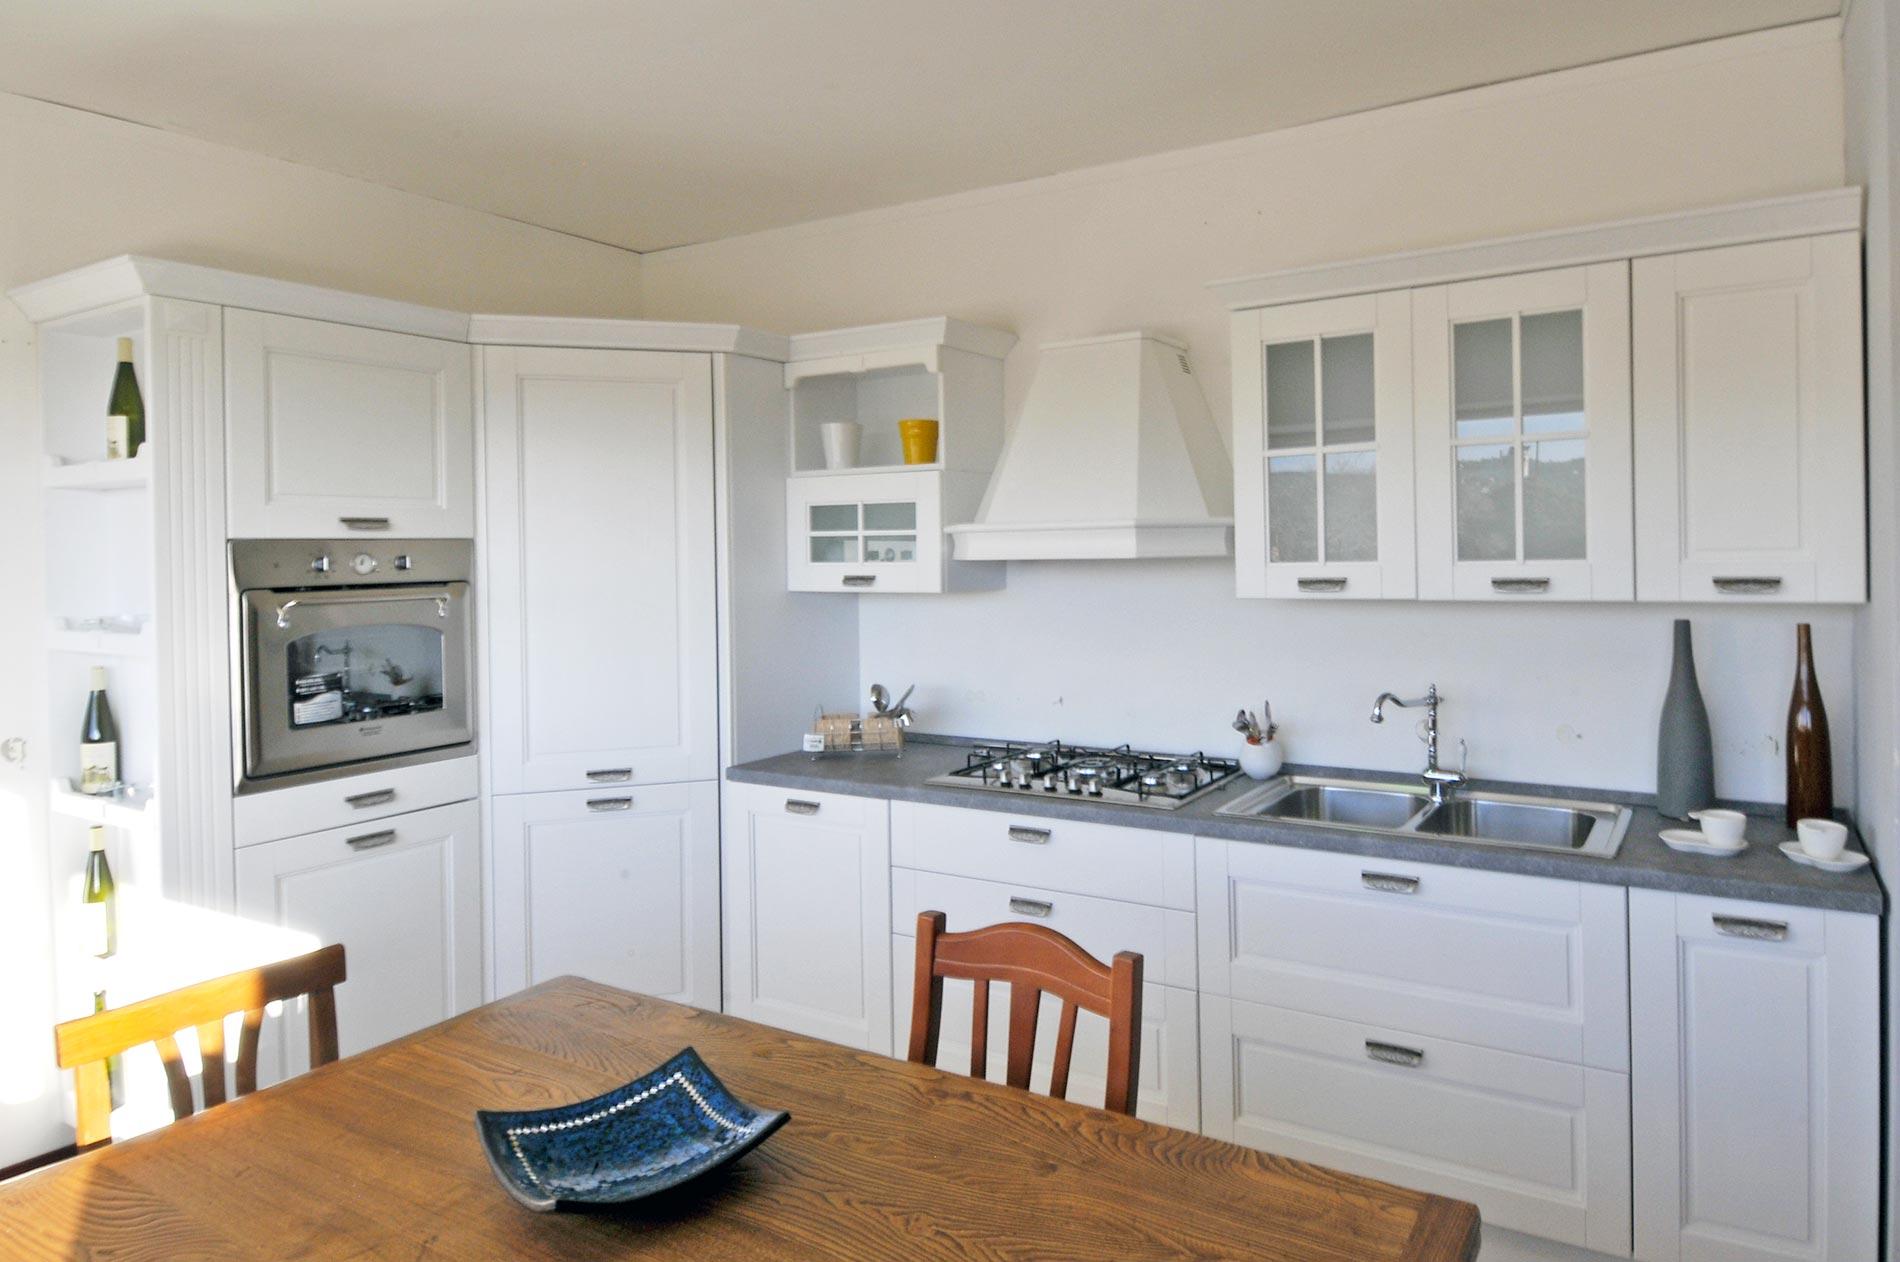 Stunning cucina classica contemporanea pictures home - Cucina classica contemporanea ...